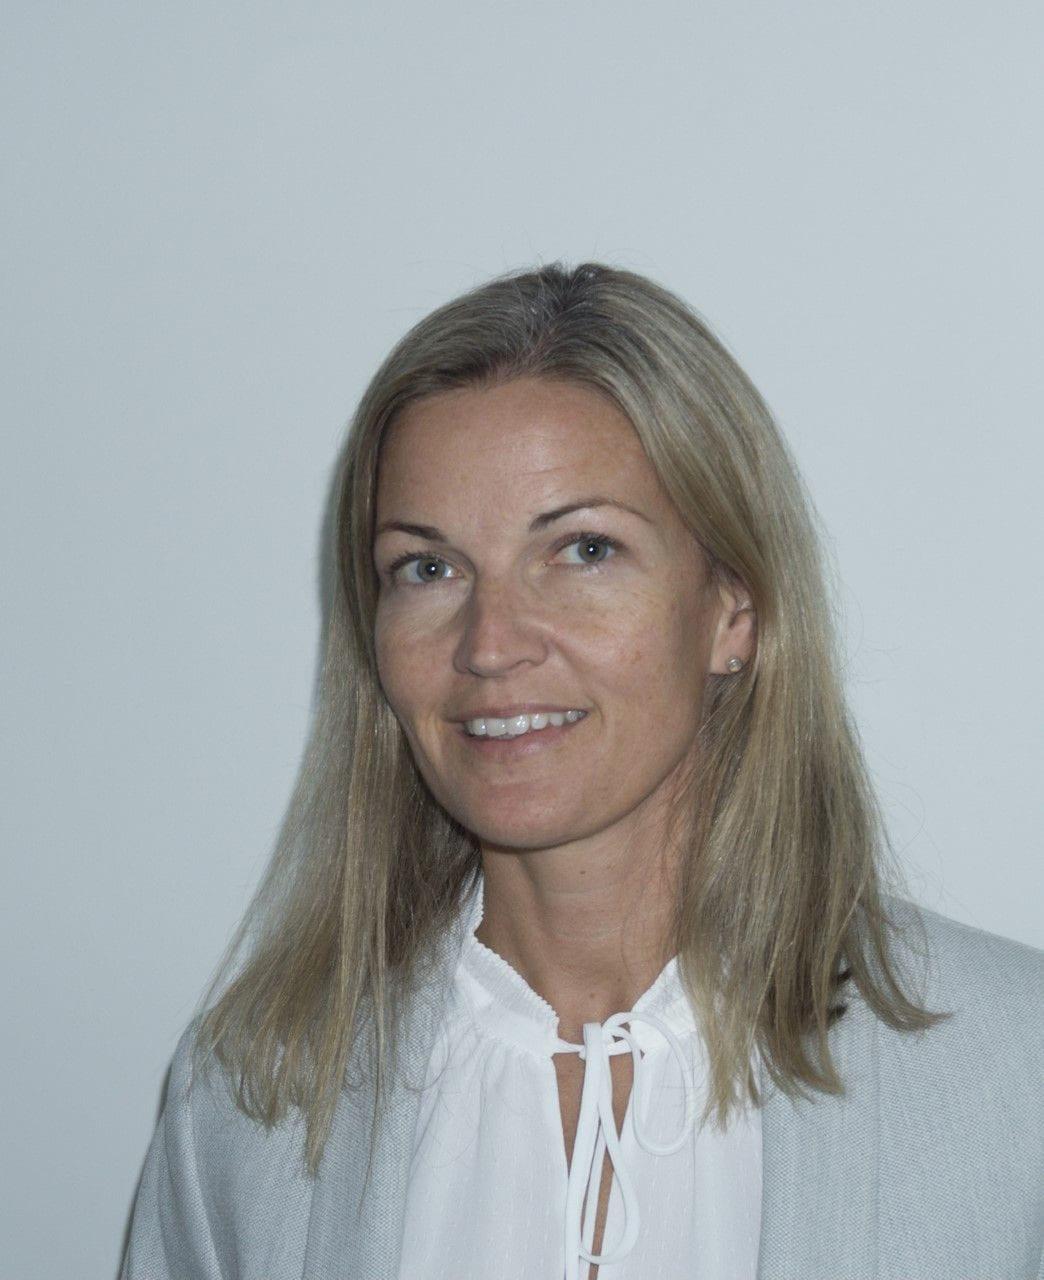 Marianne Bryhn